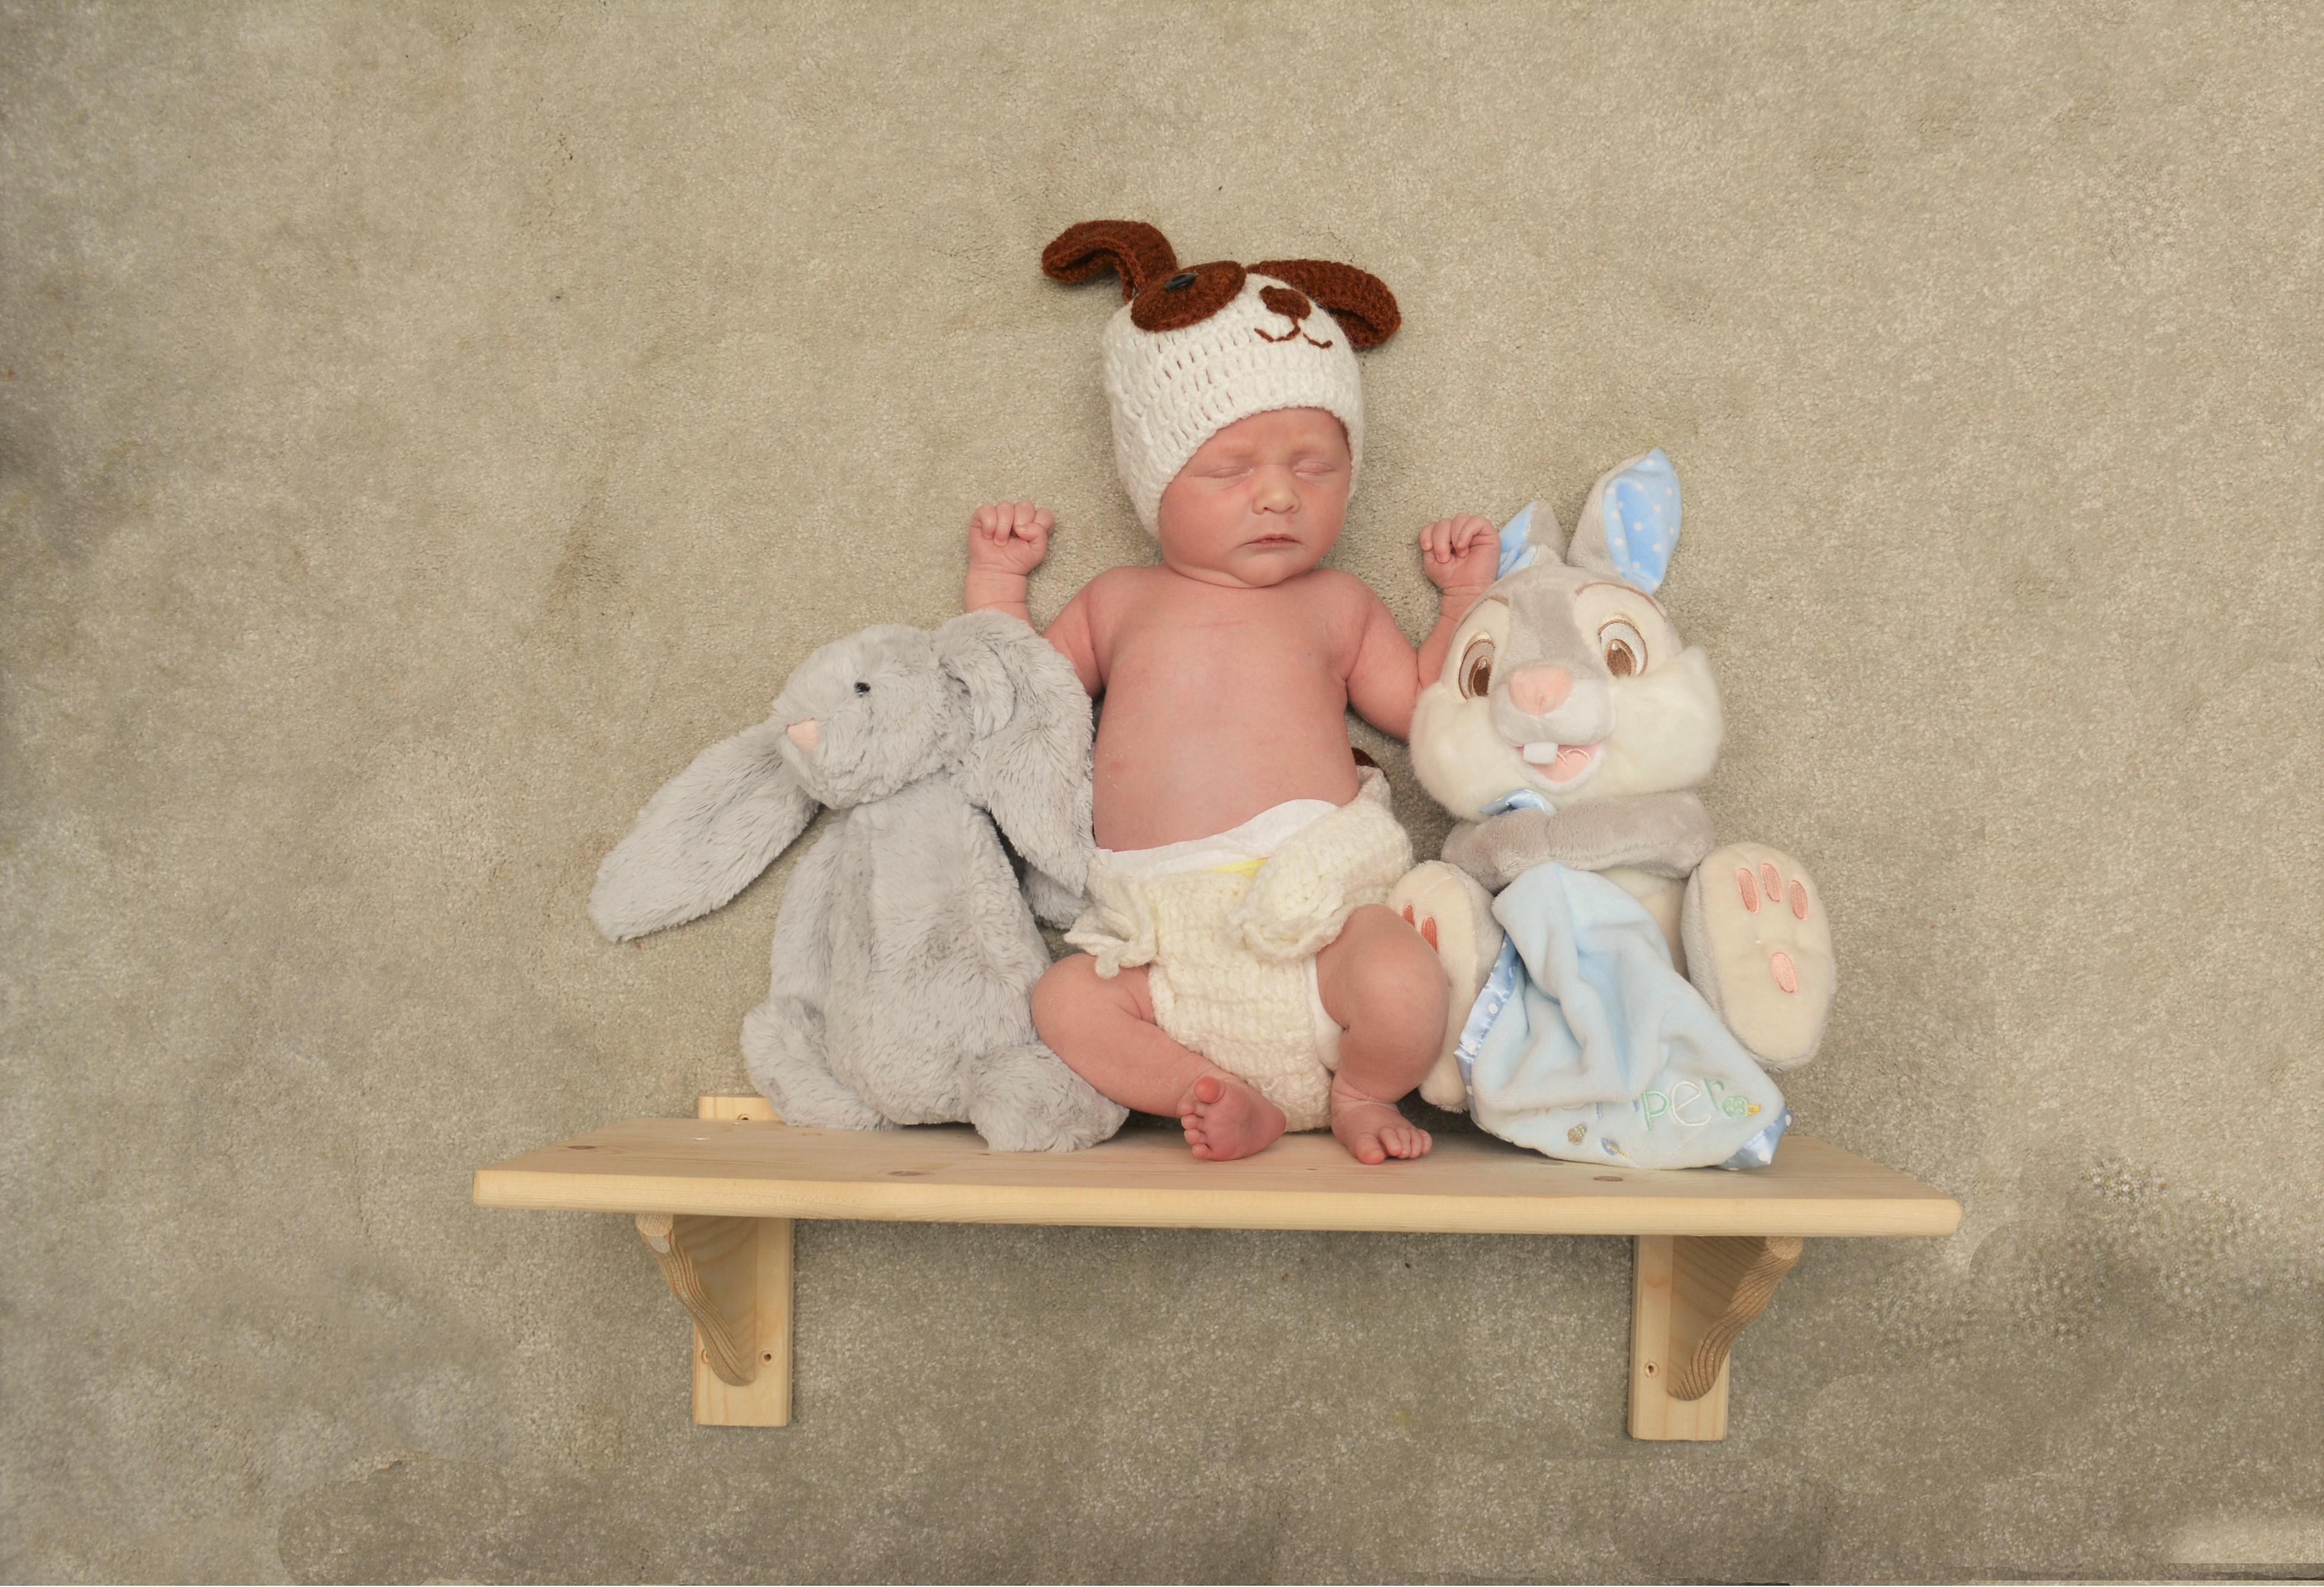 Baby on the shelf